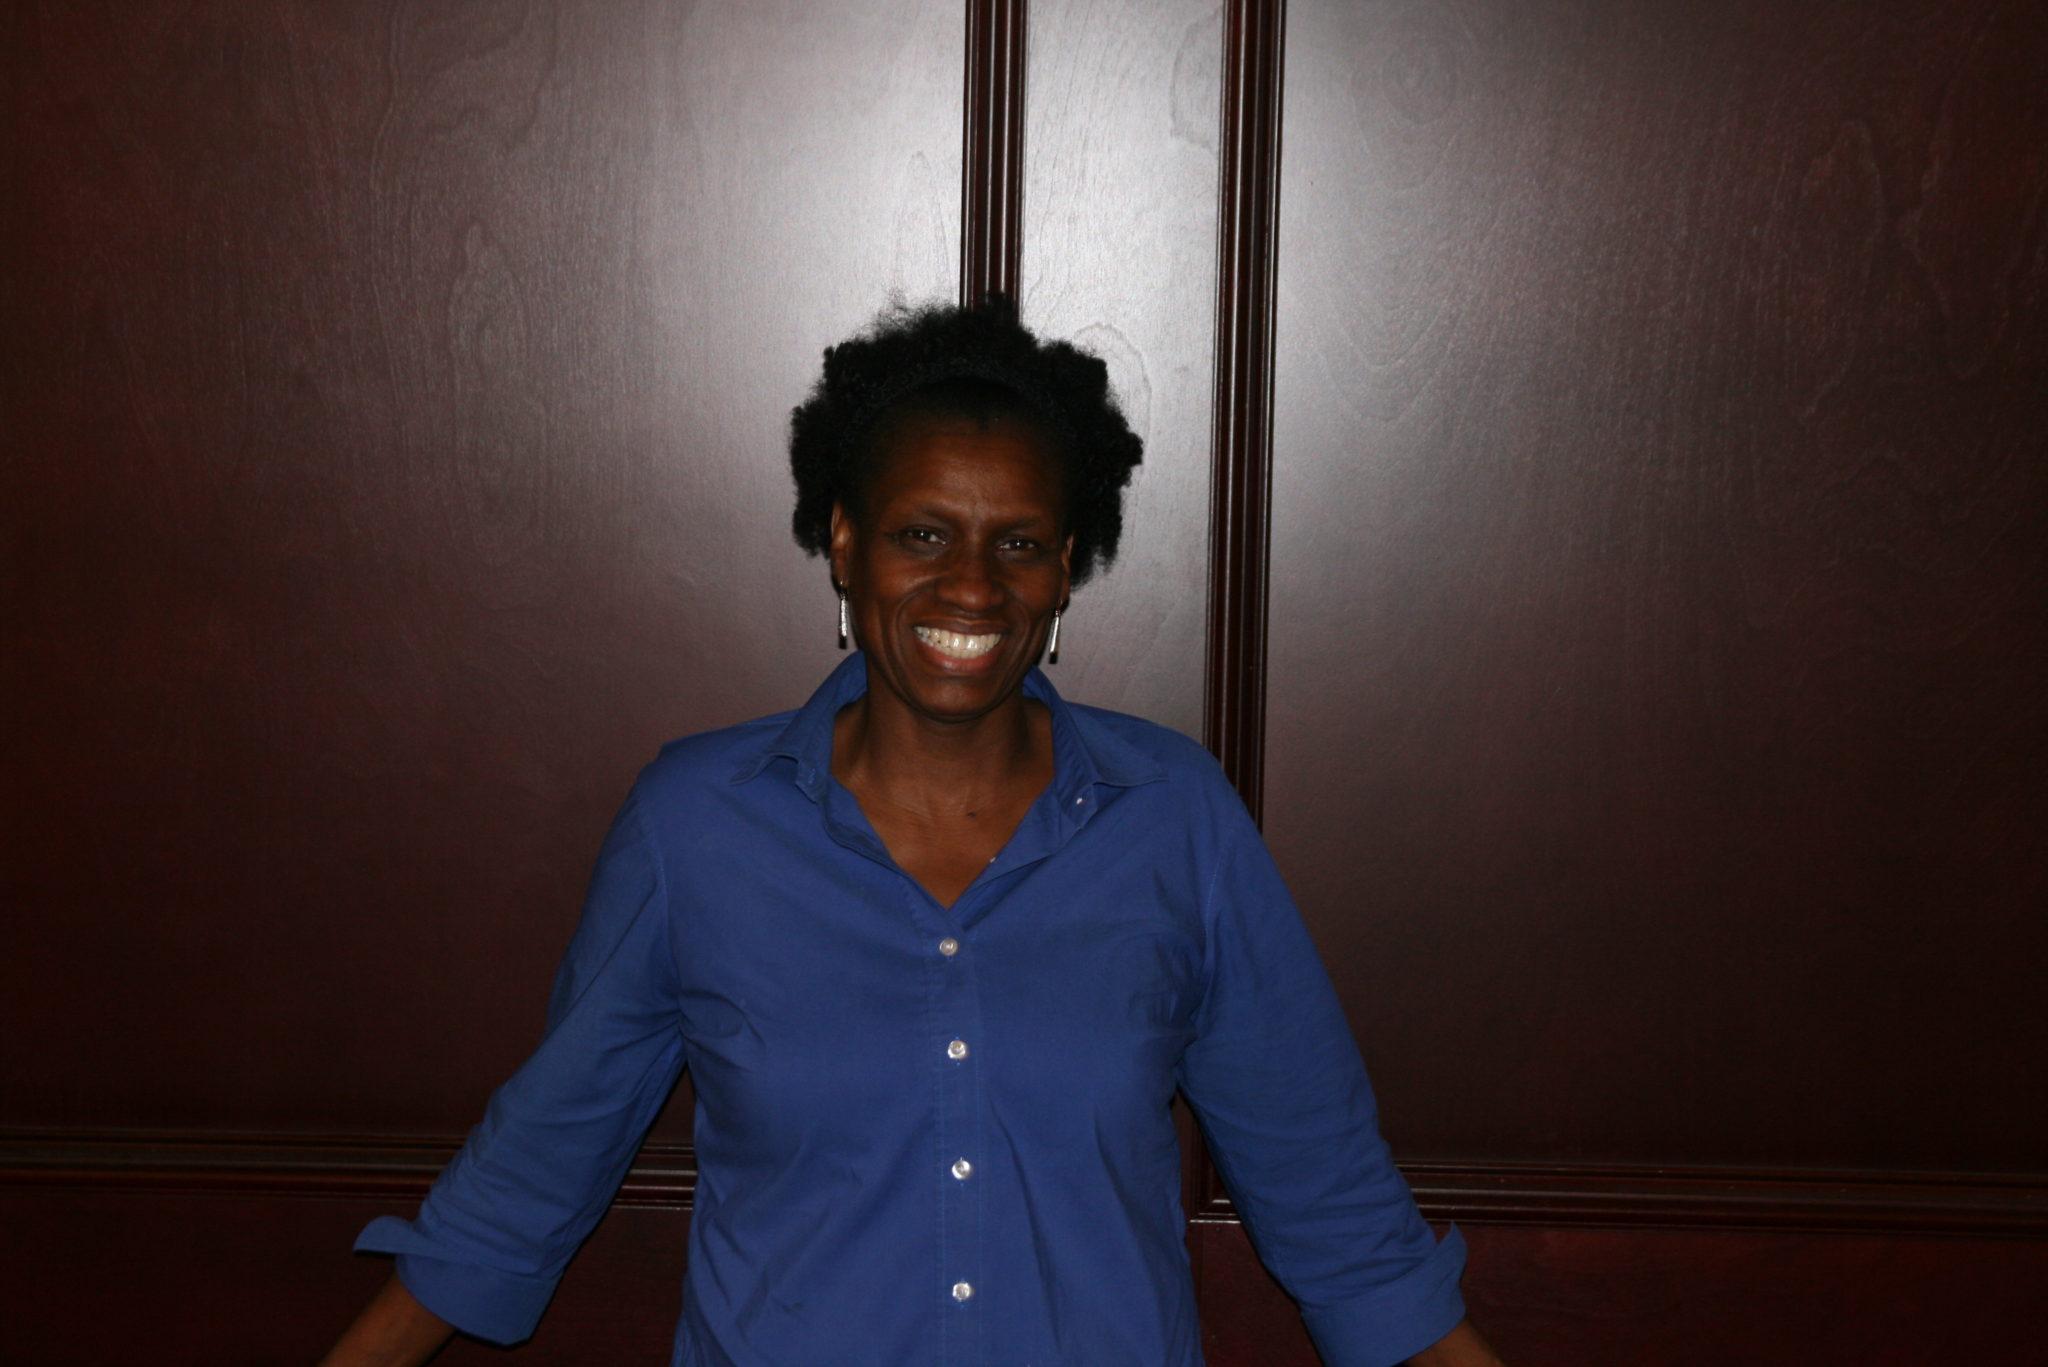 Hampton Inn Altanta Lawrenceville Employee of the year 2018